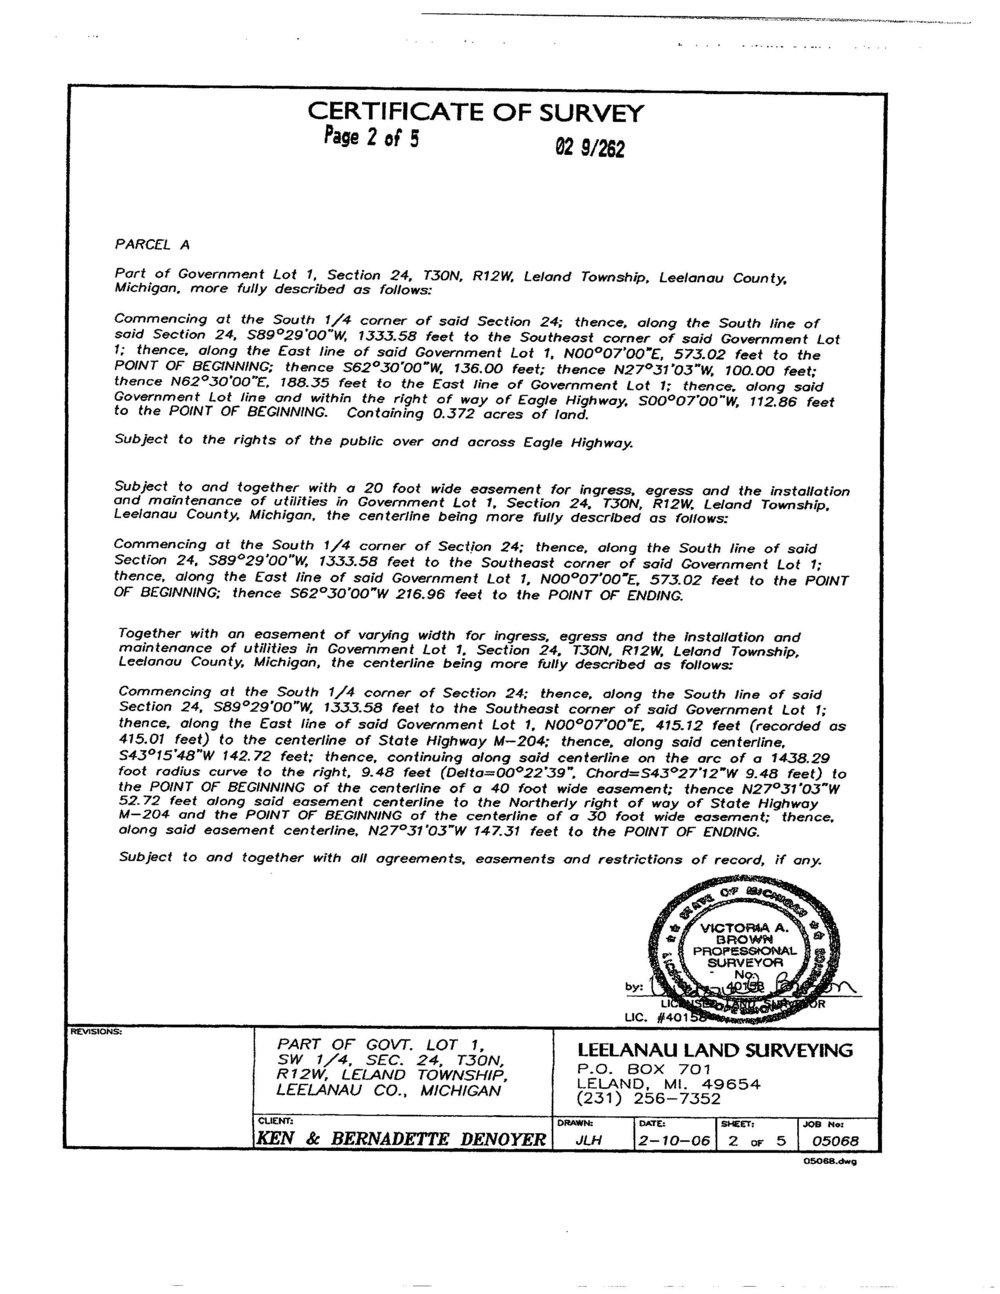 Parcel C N Eagle Highway Marketing Packet_Page_06.jpg